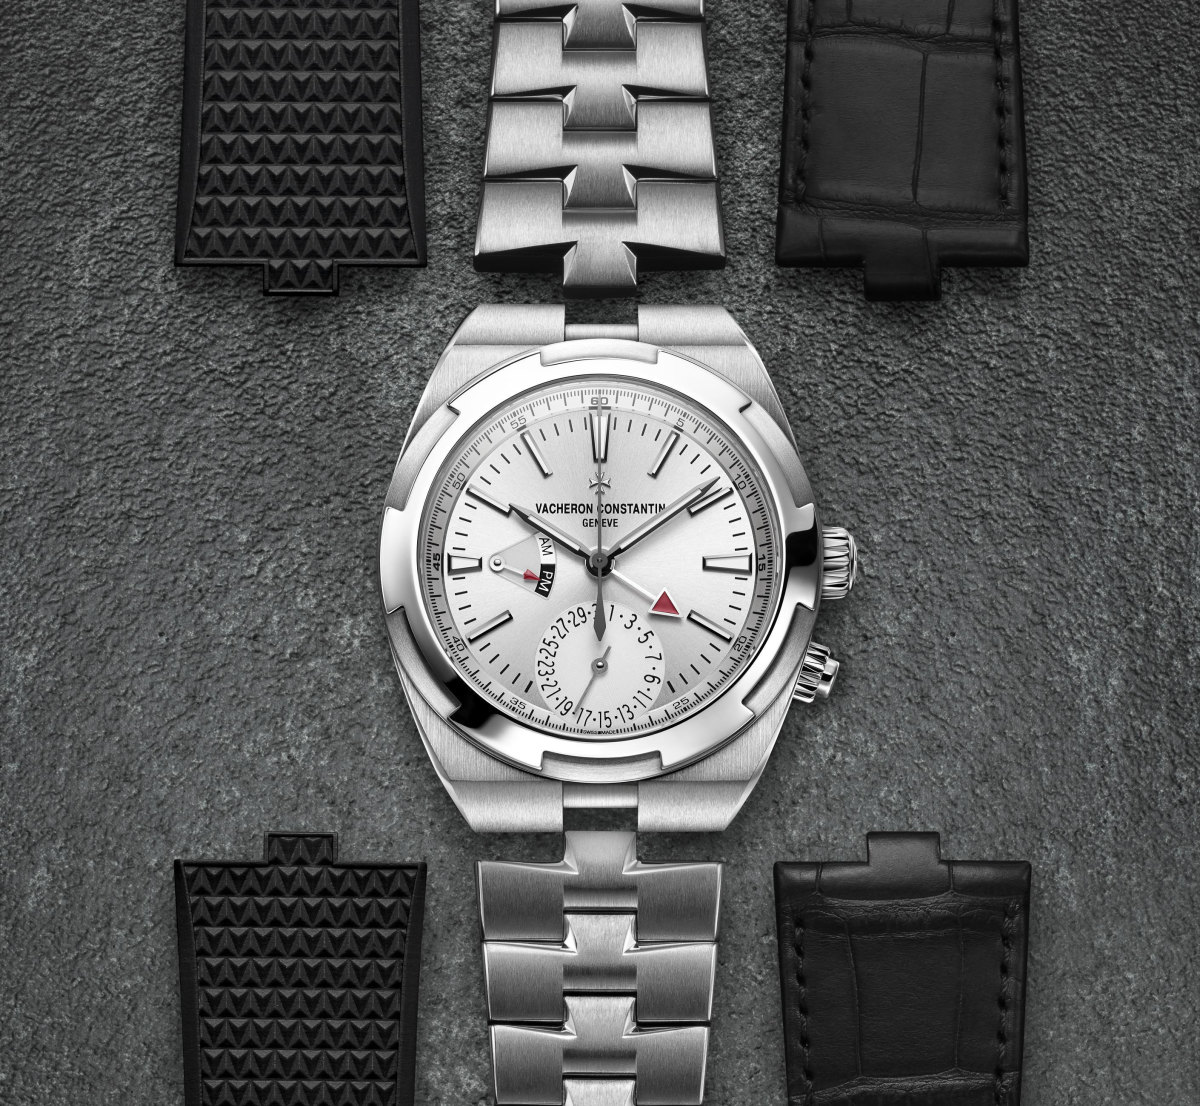 7900v-110a-b333-straps-1623868-2